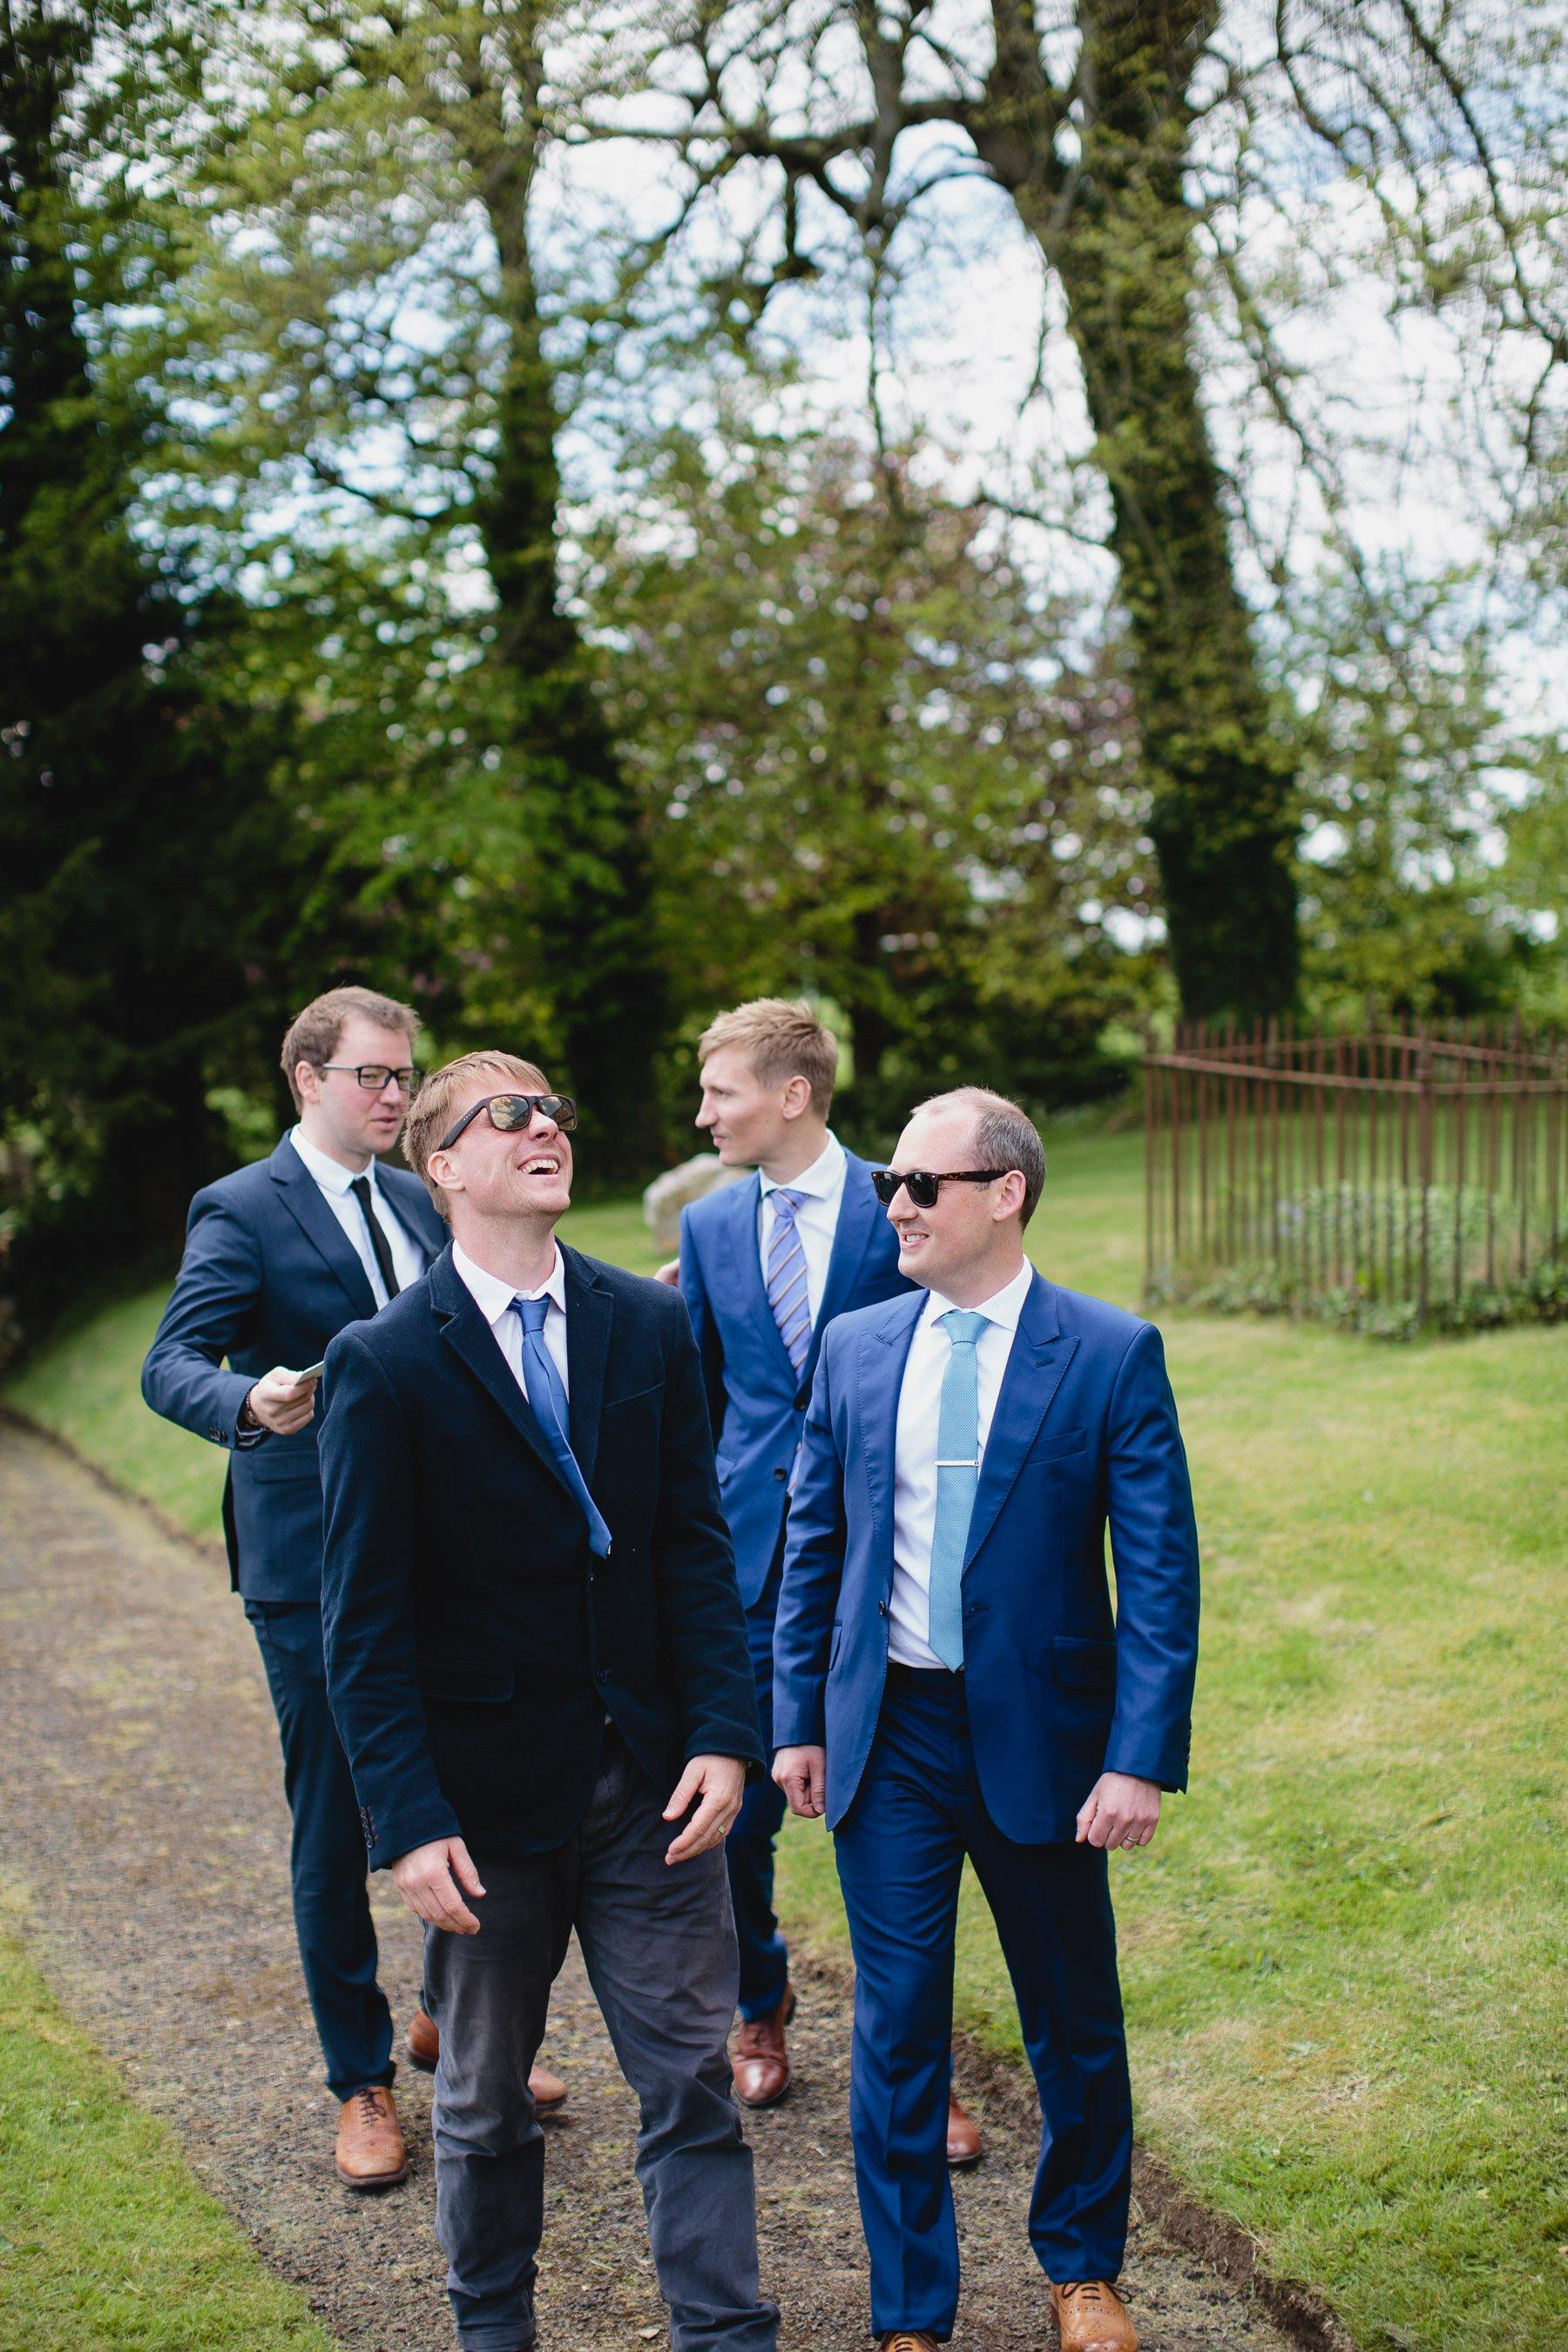 Buckinghamshire-Wedding-Lizzie-Duncan-053